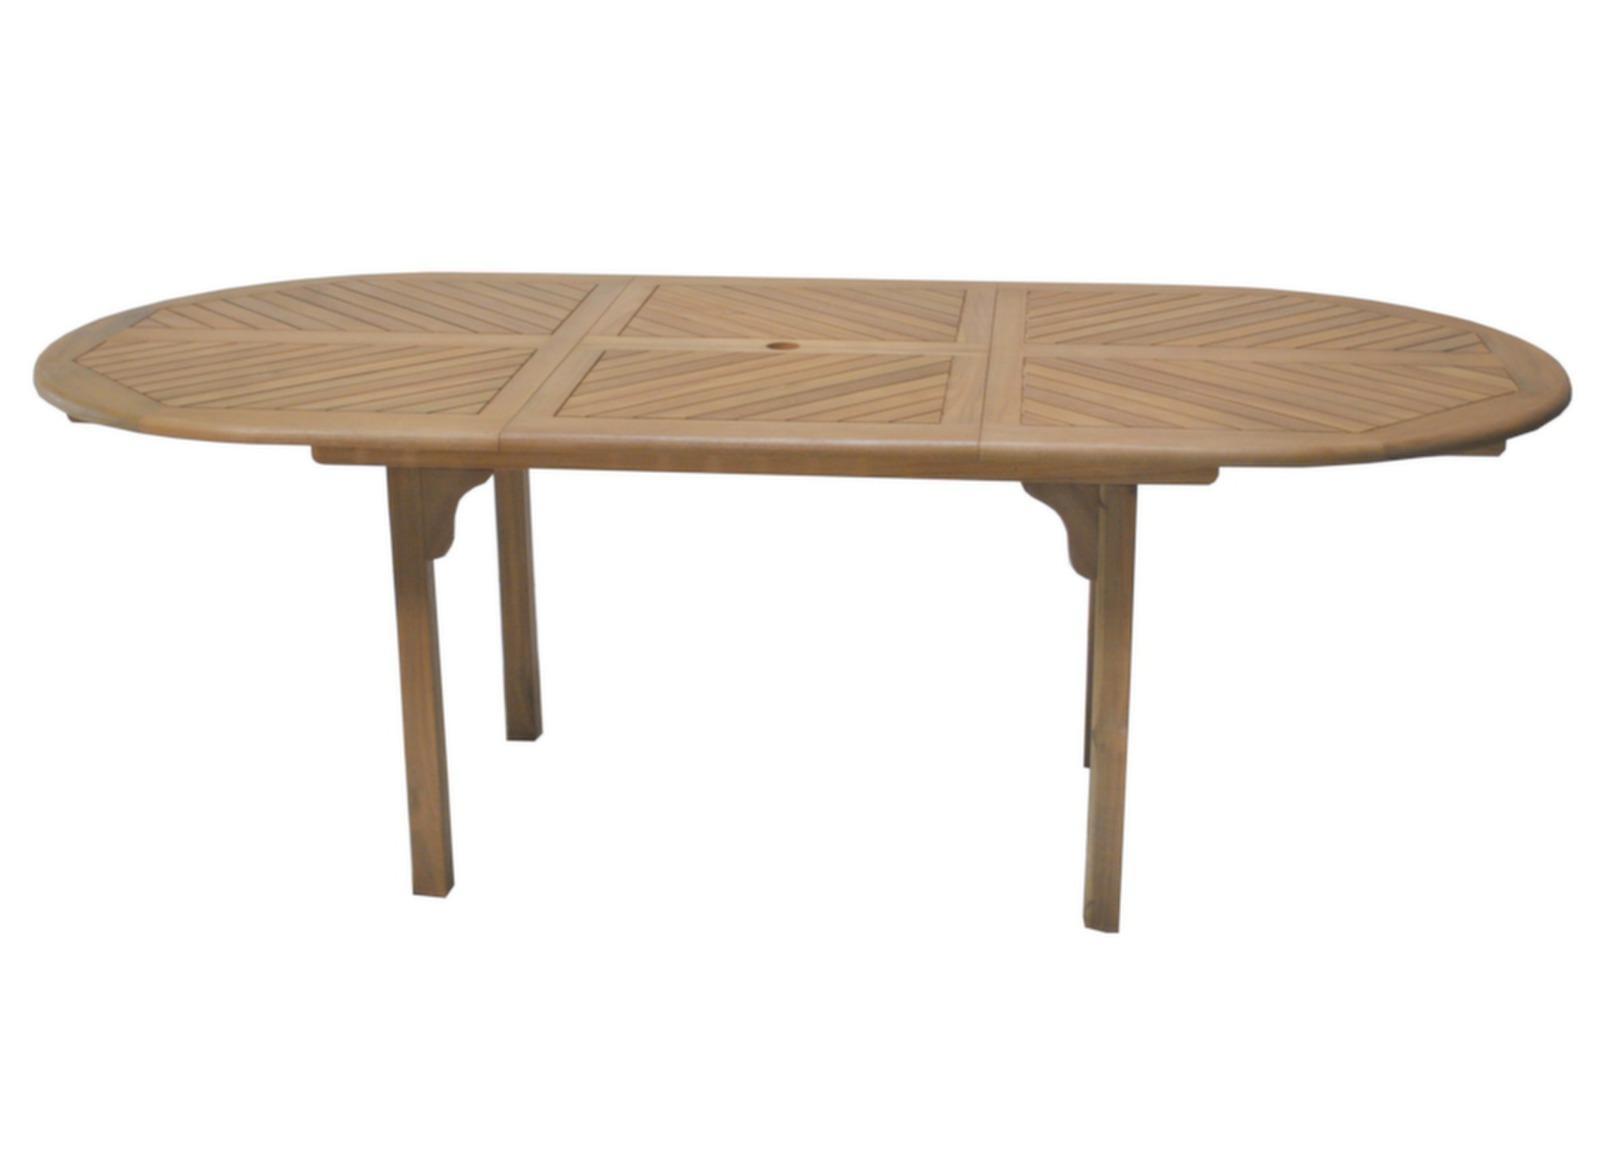 Salon de jardin table Durban + 6 chaises pliantes - Proloisirs